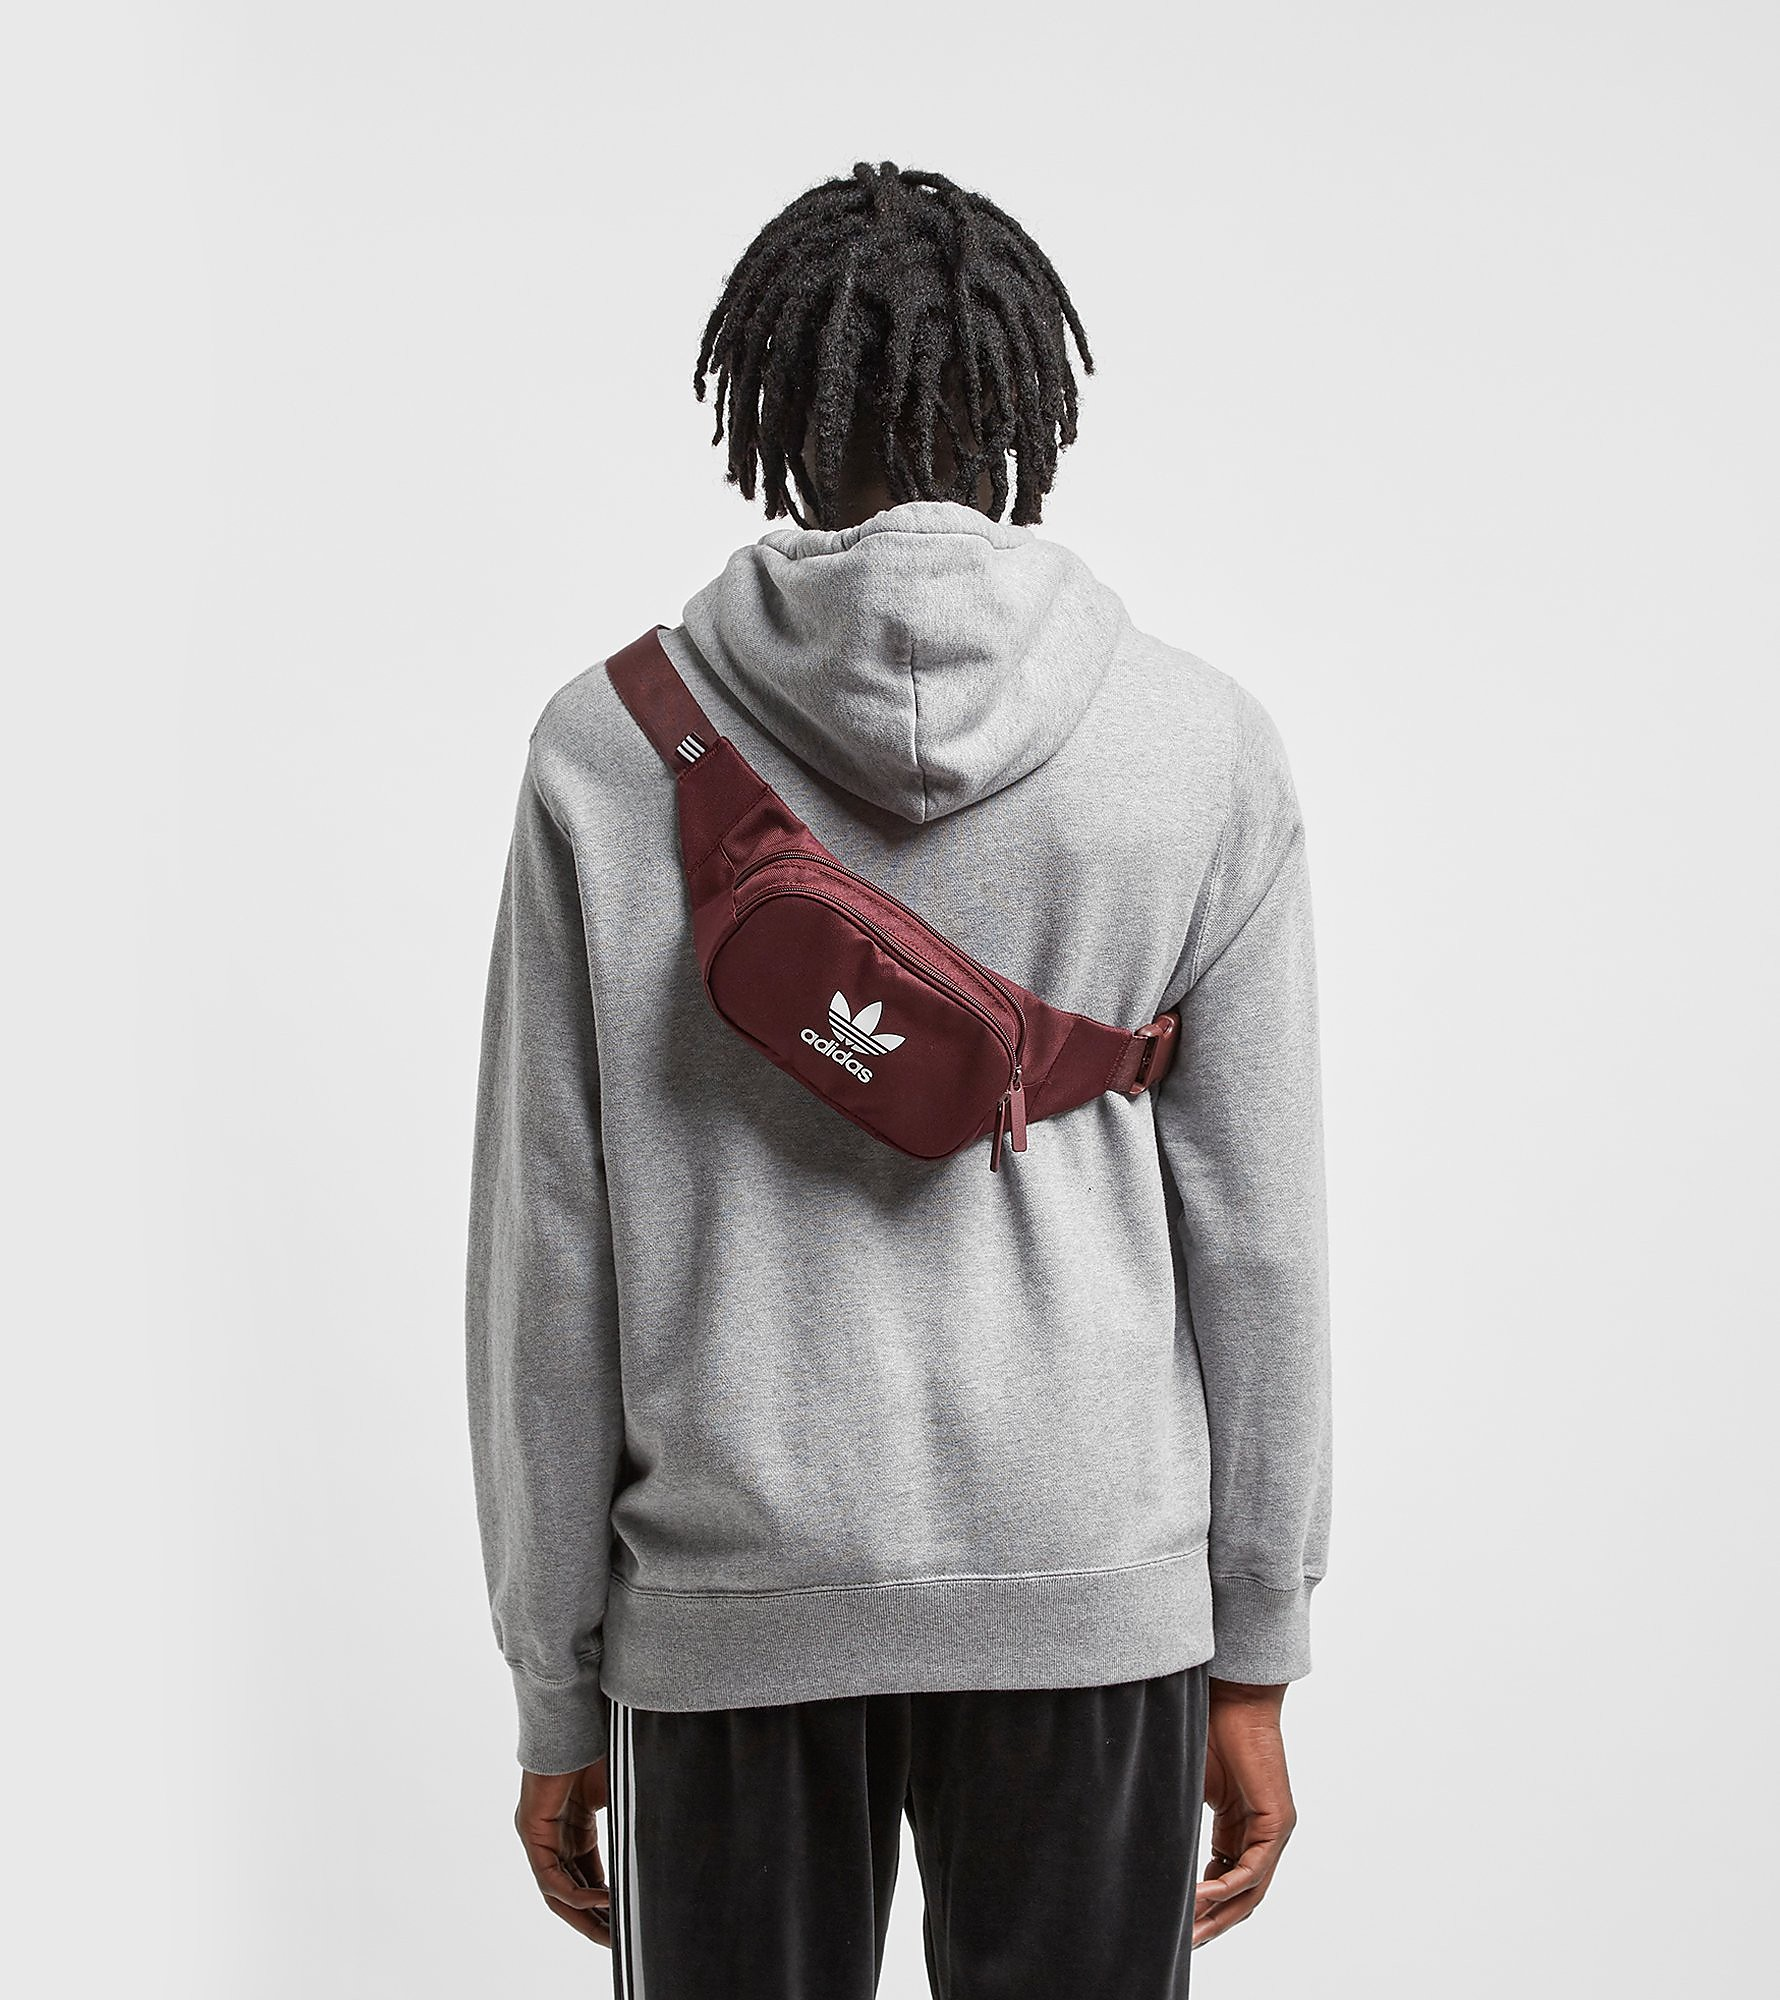 adidas Originals Trefoil Waist Bag, Rood